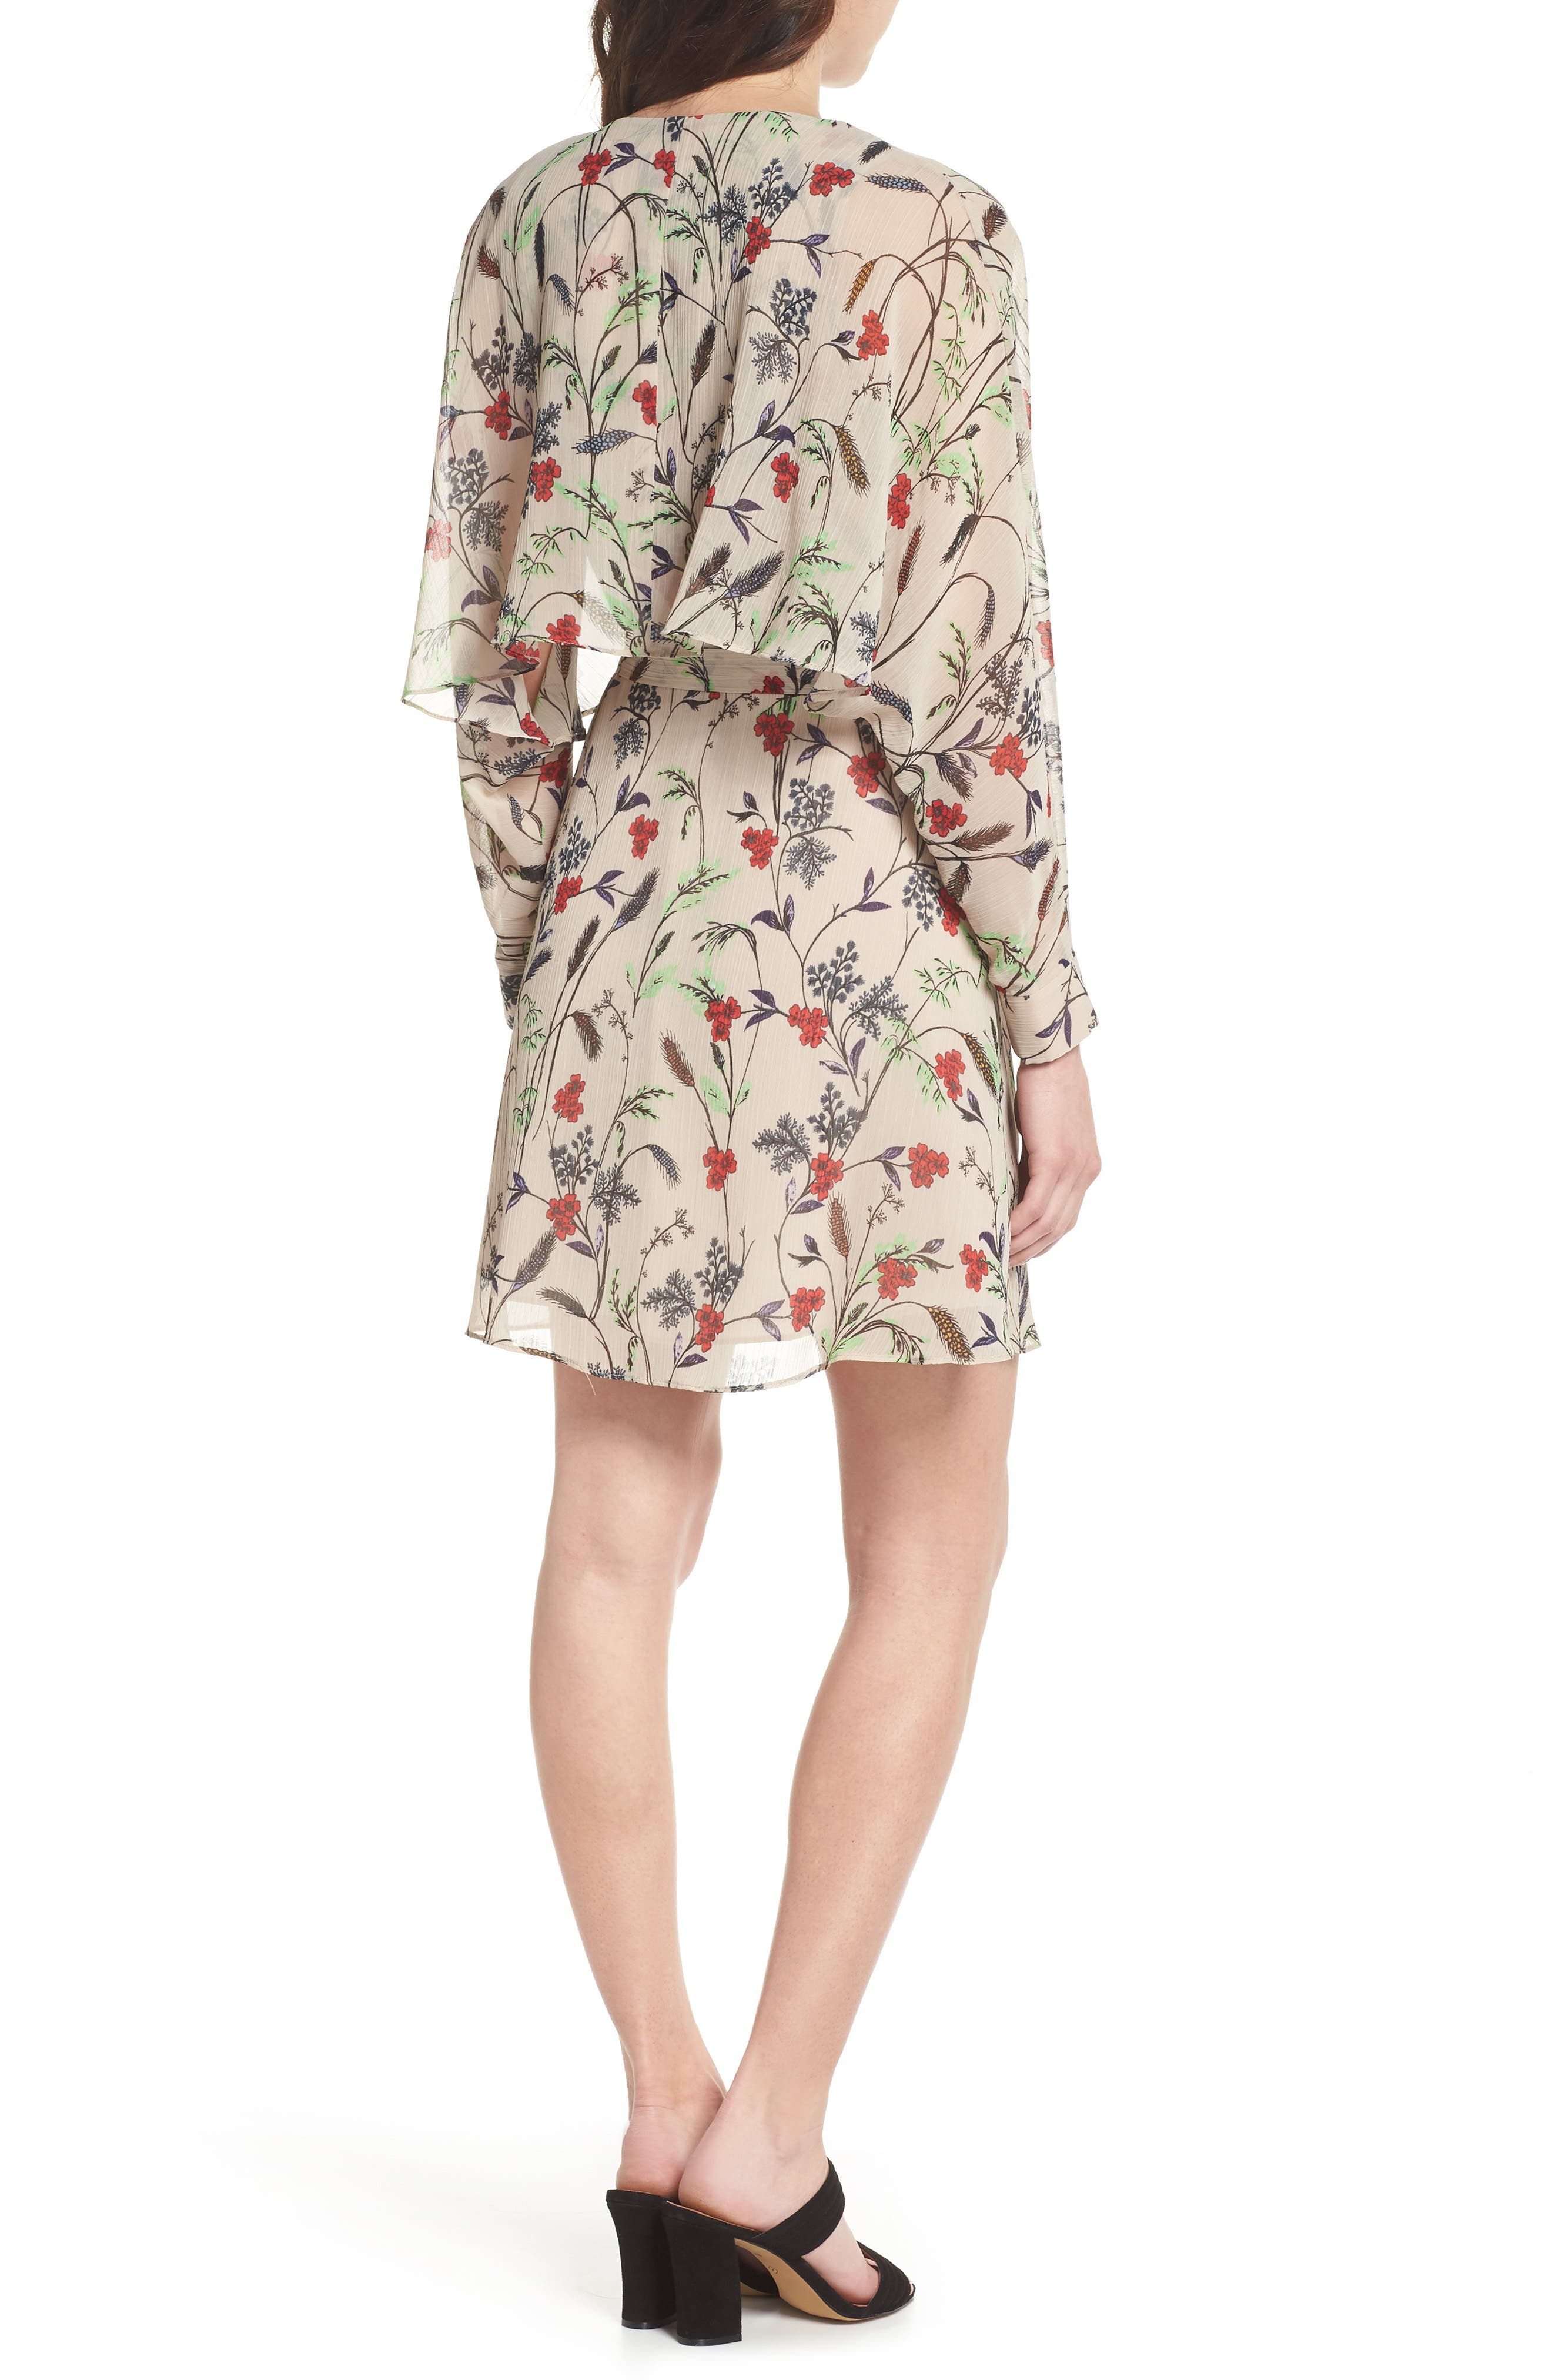 Yoryu Floral Chiffon Dress,                             Alternate thumbnail 2, color,                             280